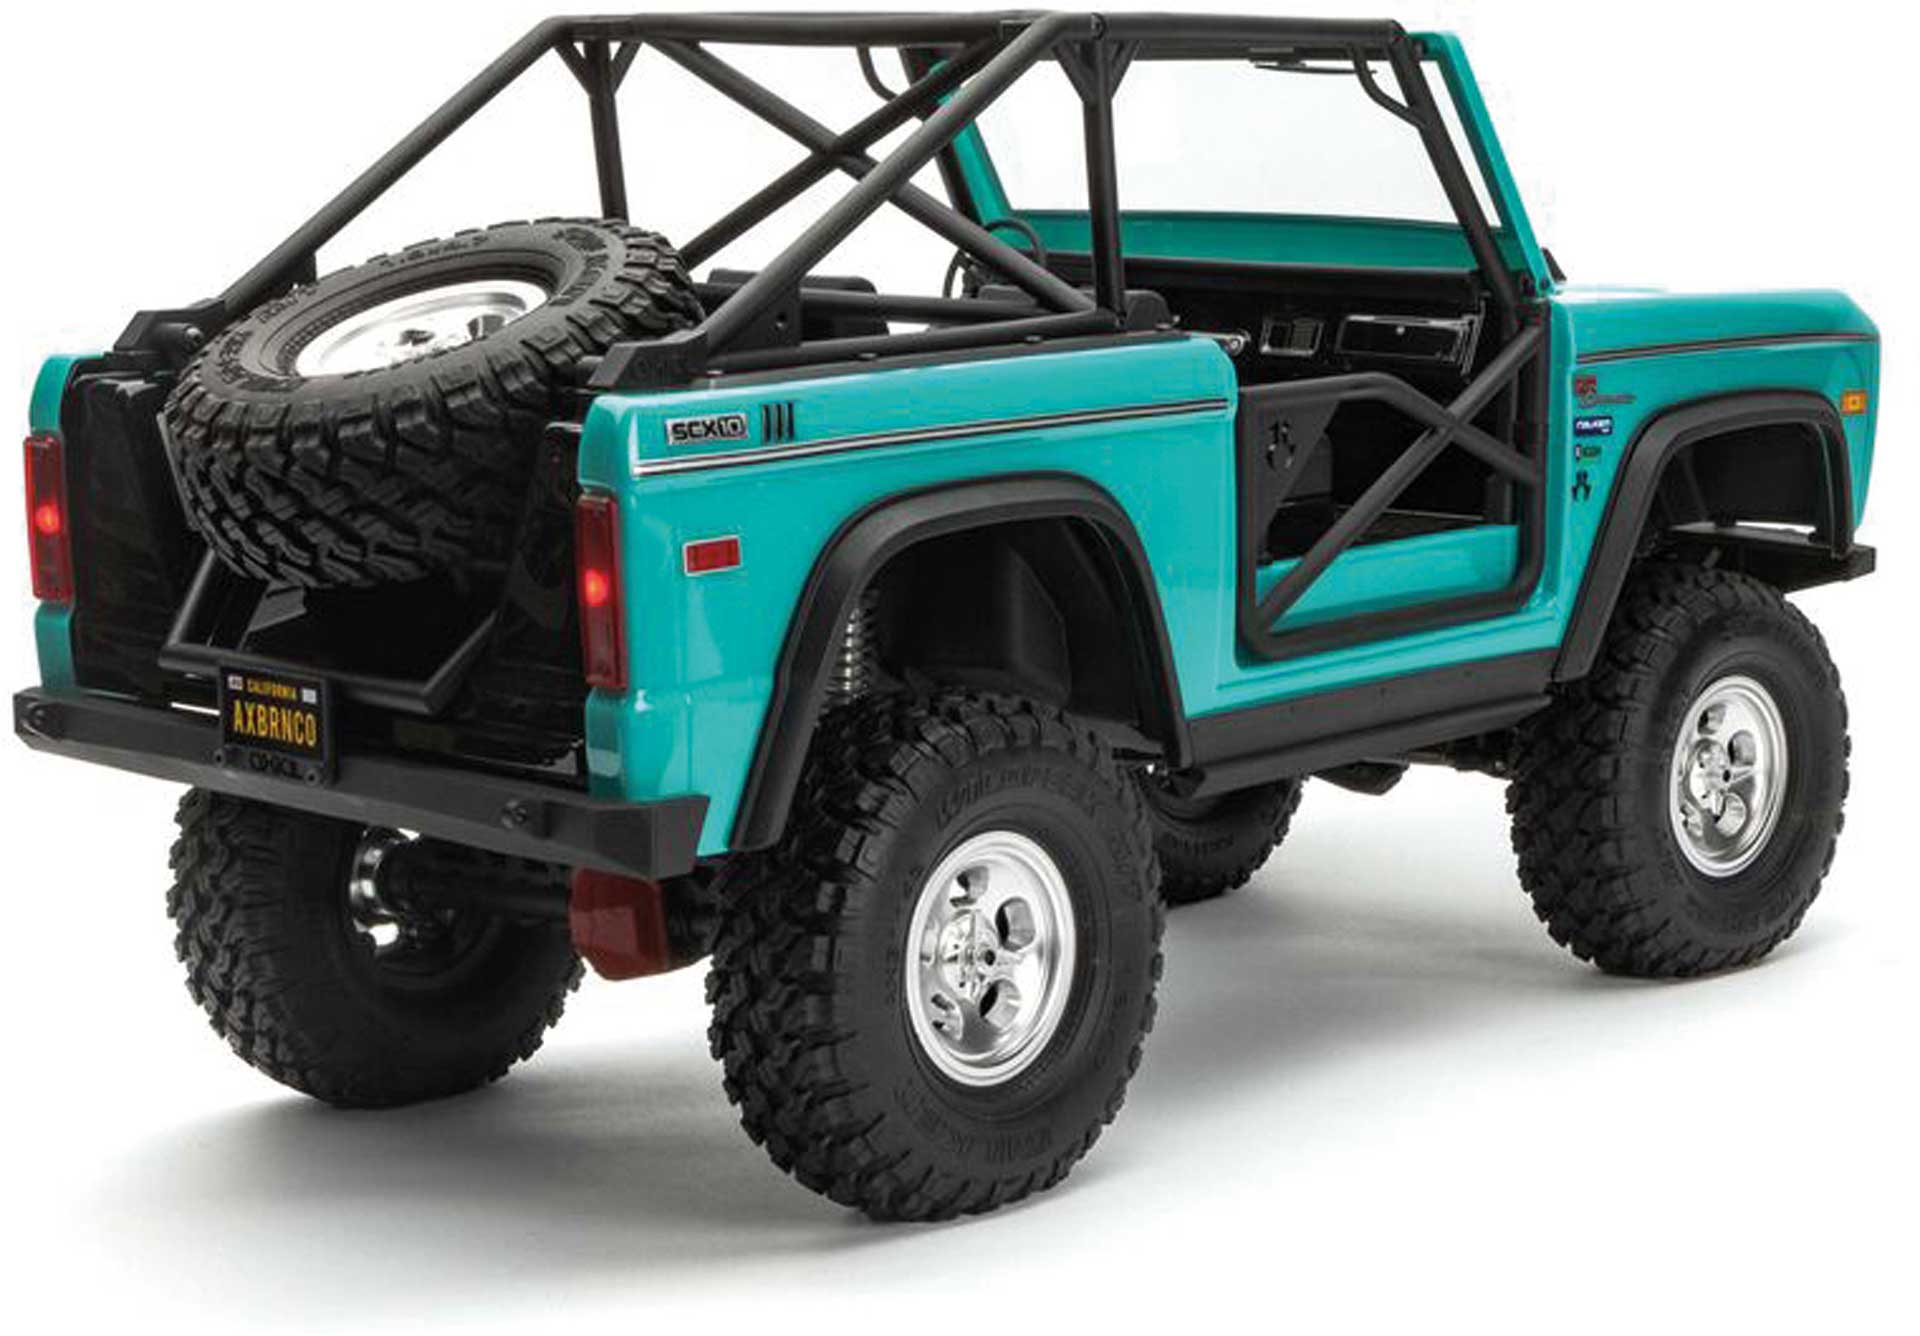 AXIAL SCX10 III Early Ford Bronco 4WD 1/10 RTR Türkis-Blau